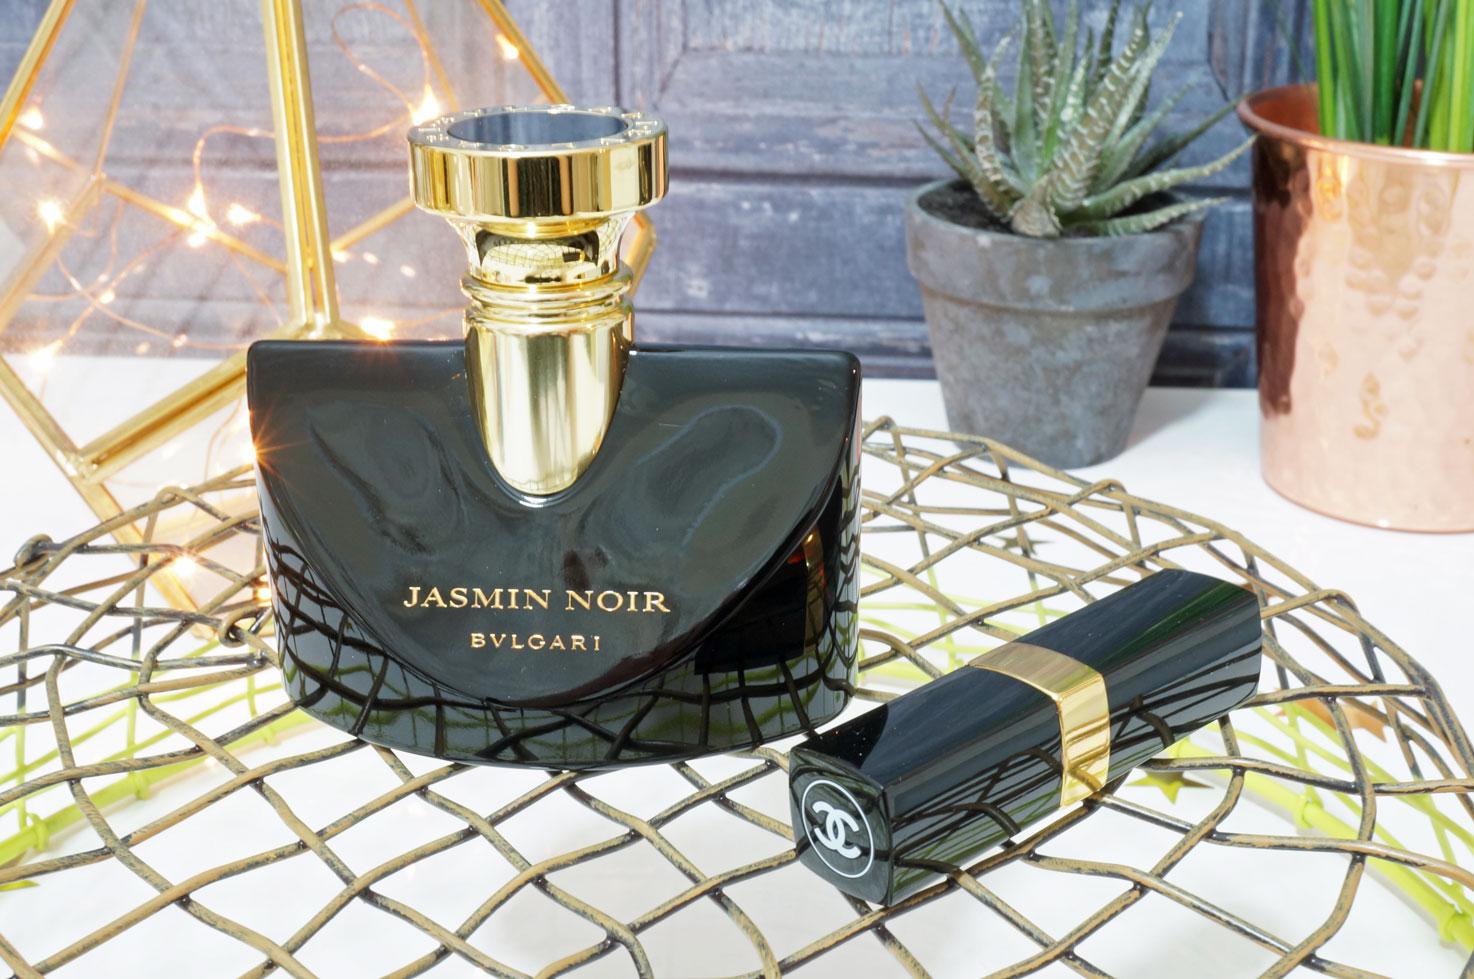 Bvlgari Jasmin Noir Eau De Parfum - Thou Shalt Not Covet... d5ff68fee9d